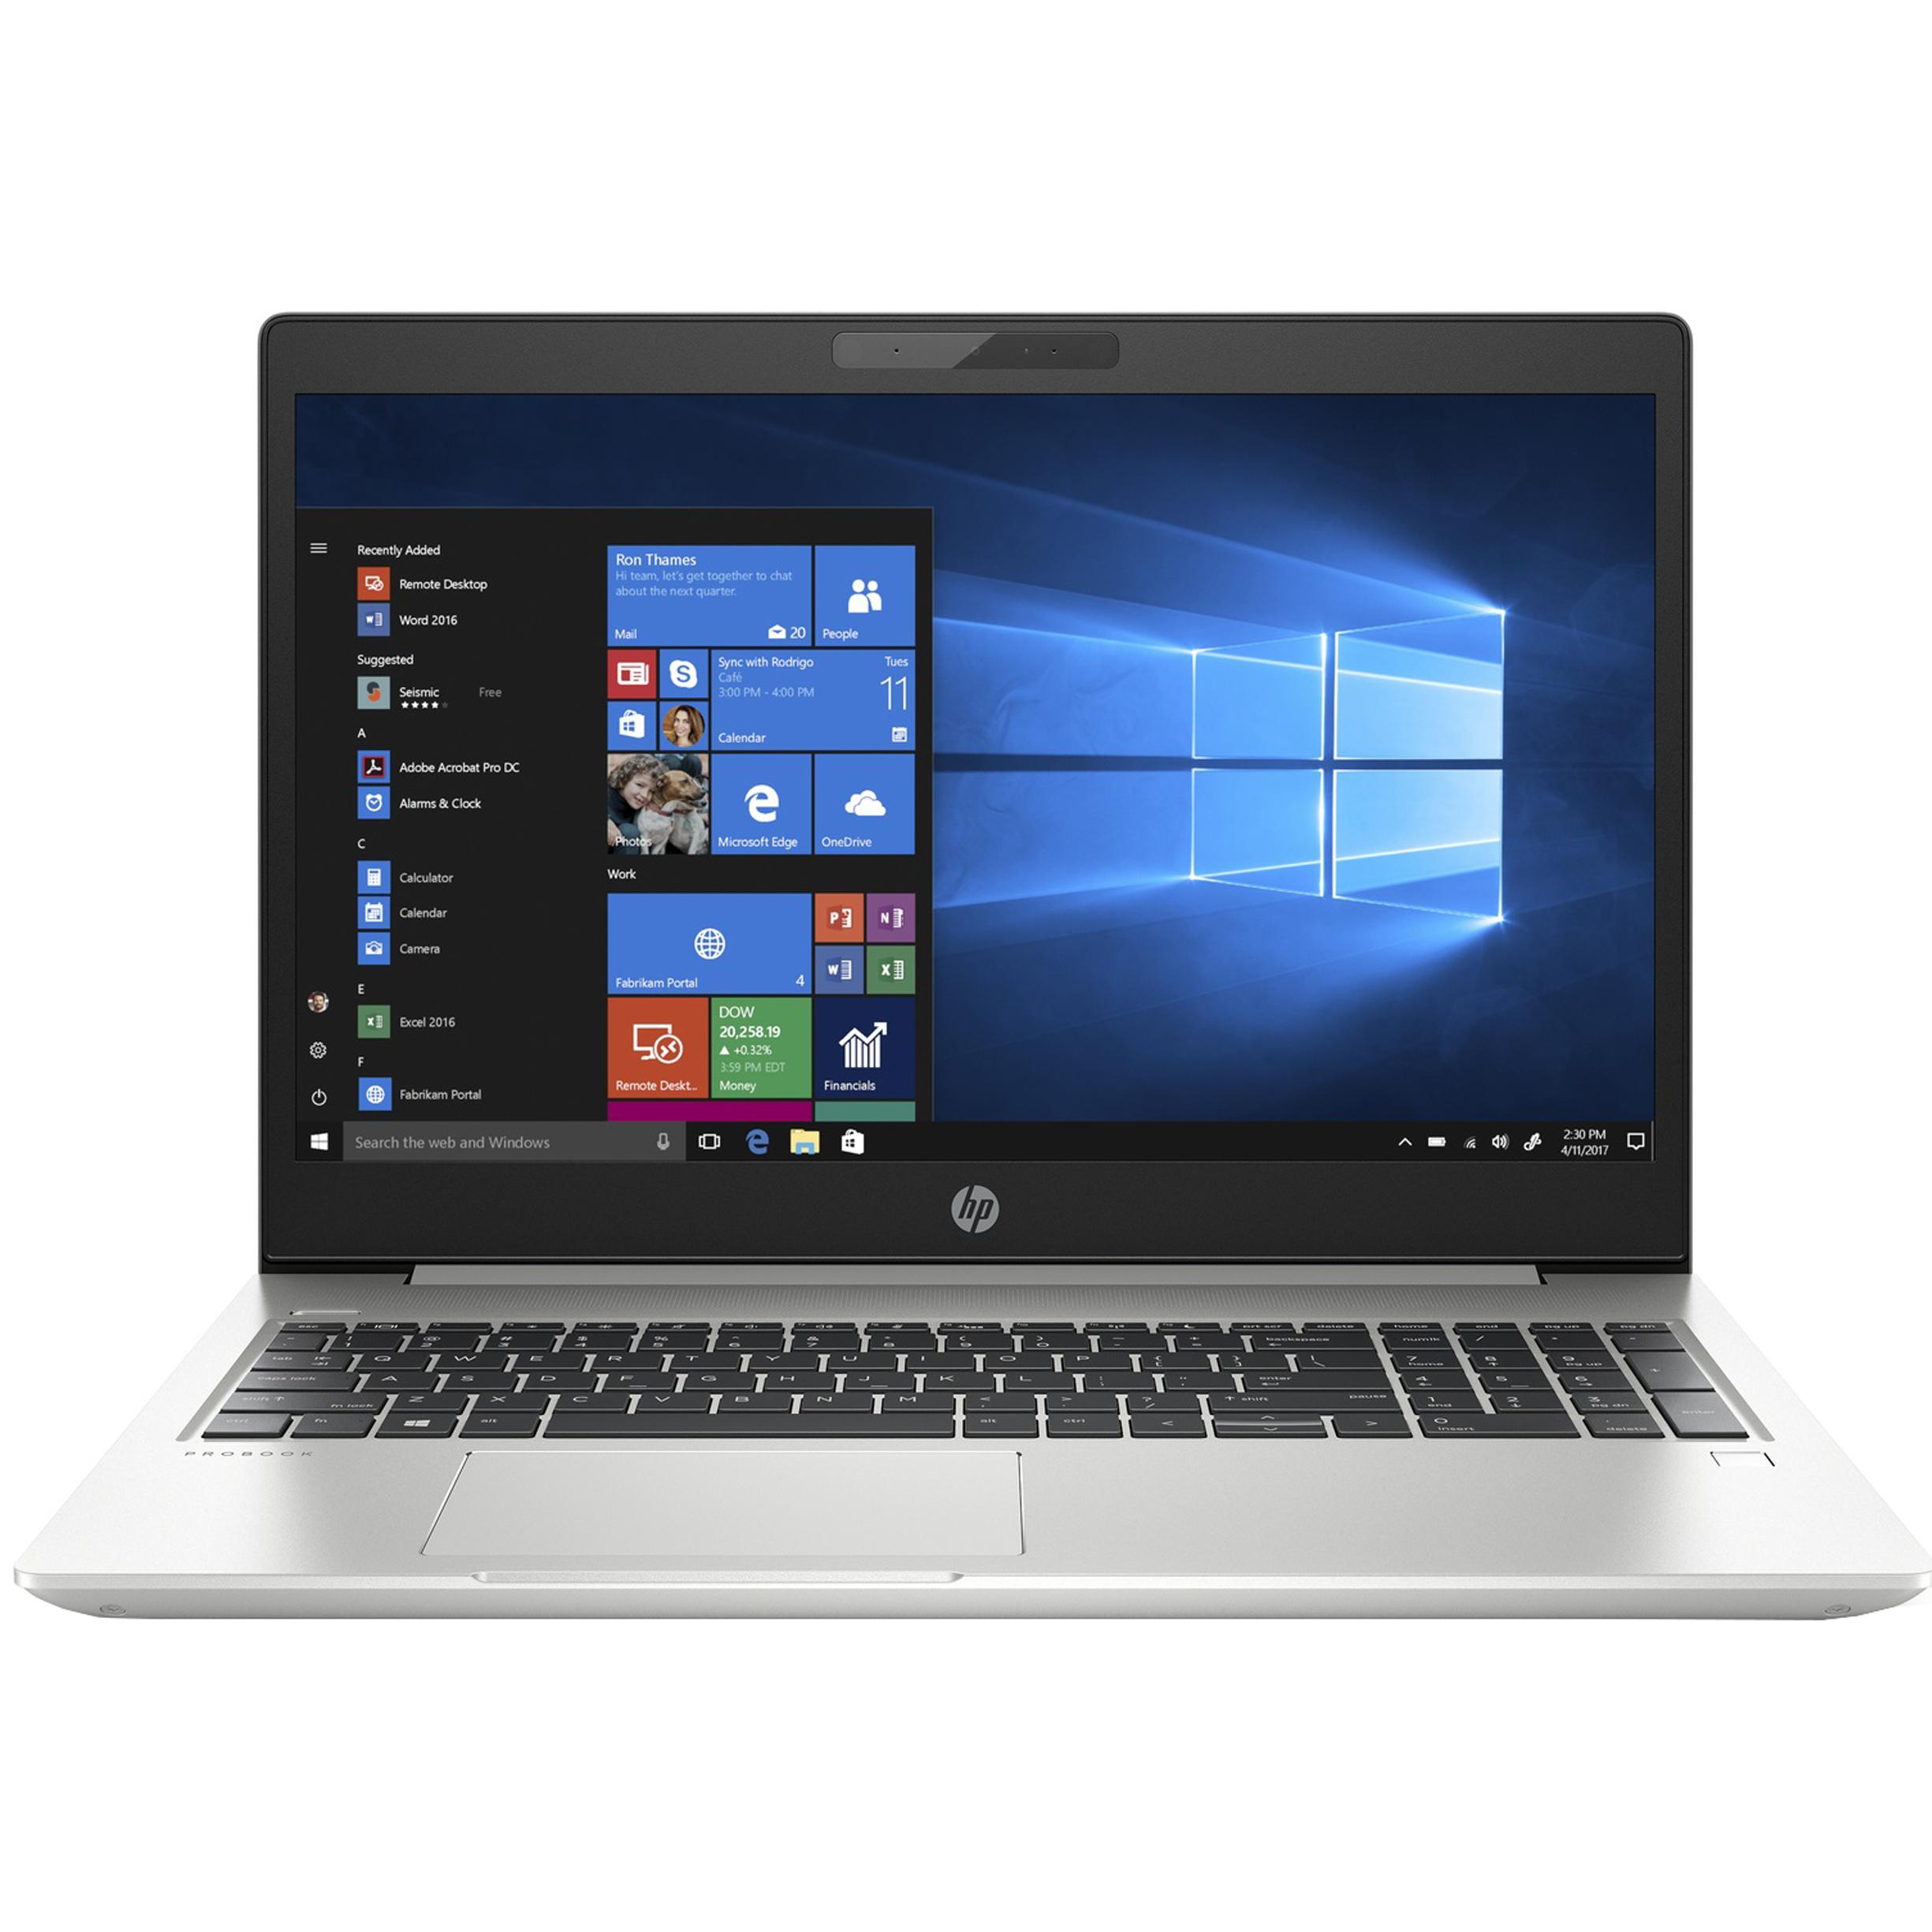 لپ تاپ 15 اینچی اچ پی مدل ProBook 450 G6 - D